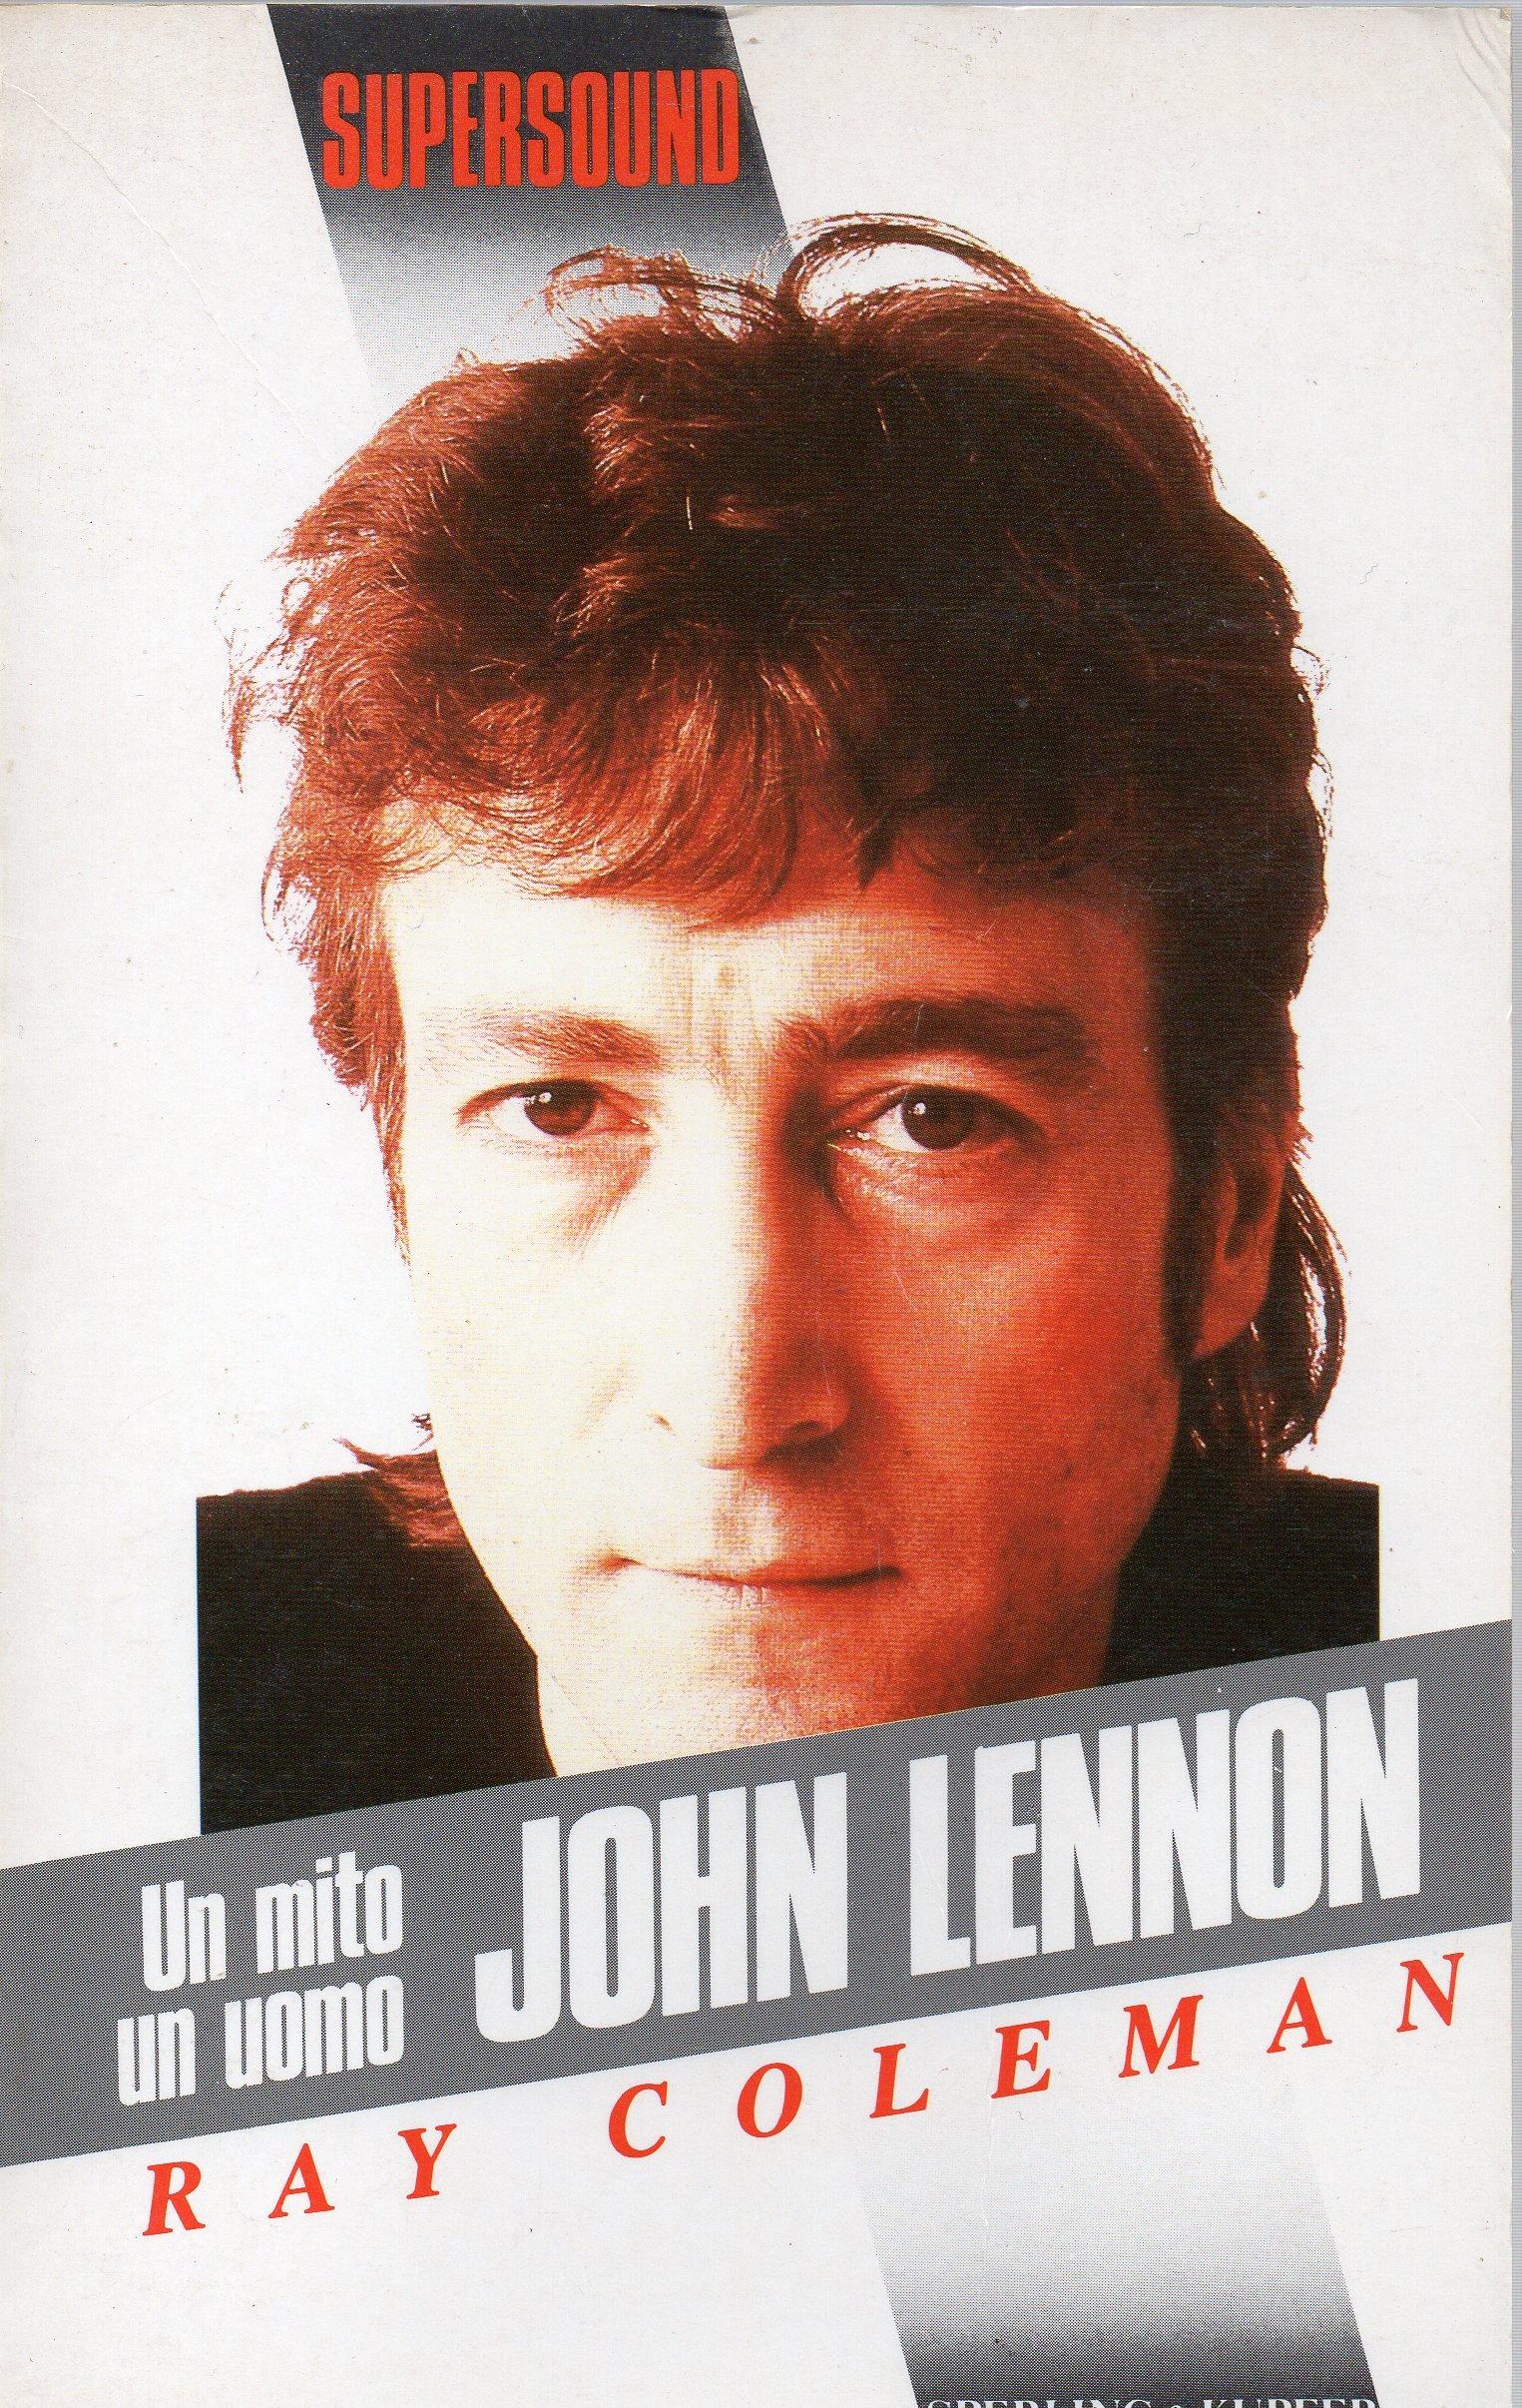 Un mito, un uomo: John Lennon